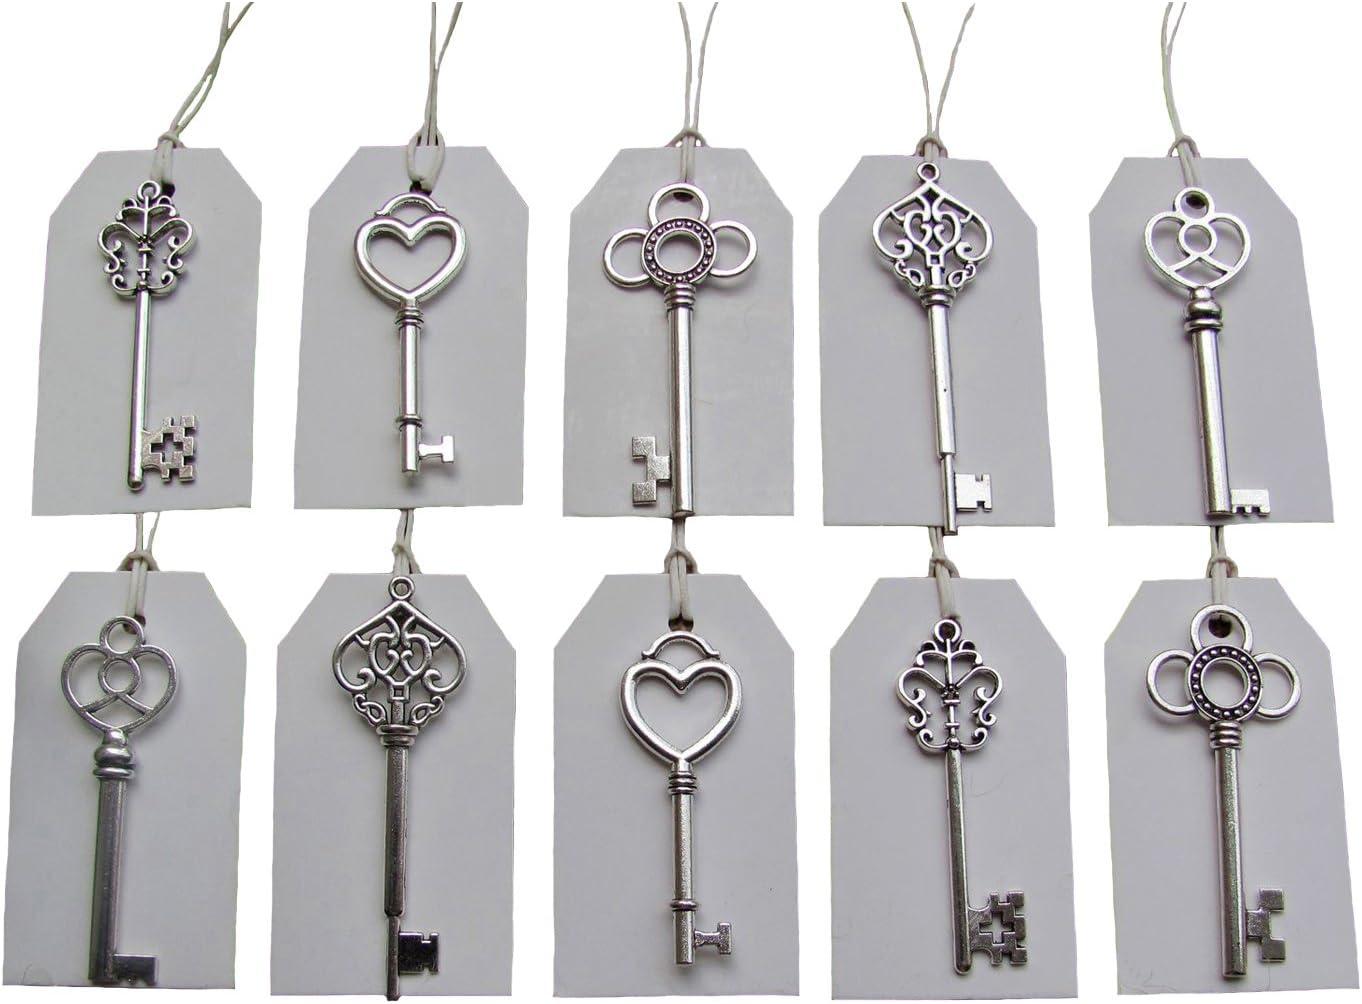 10 Heart Key Pendants Key Charms Antiqued Silver Skeleton Keys Steampunk Keys